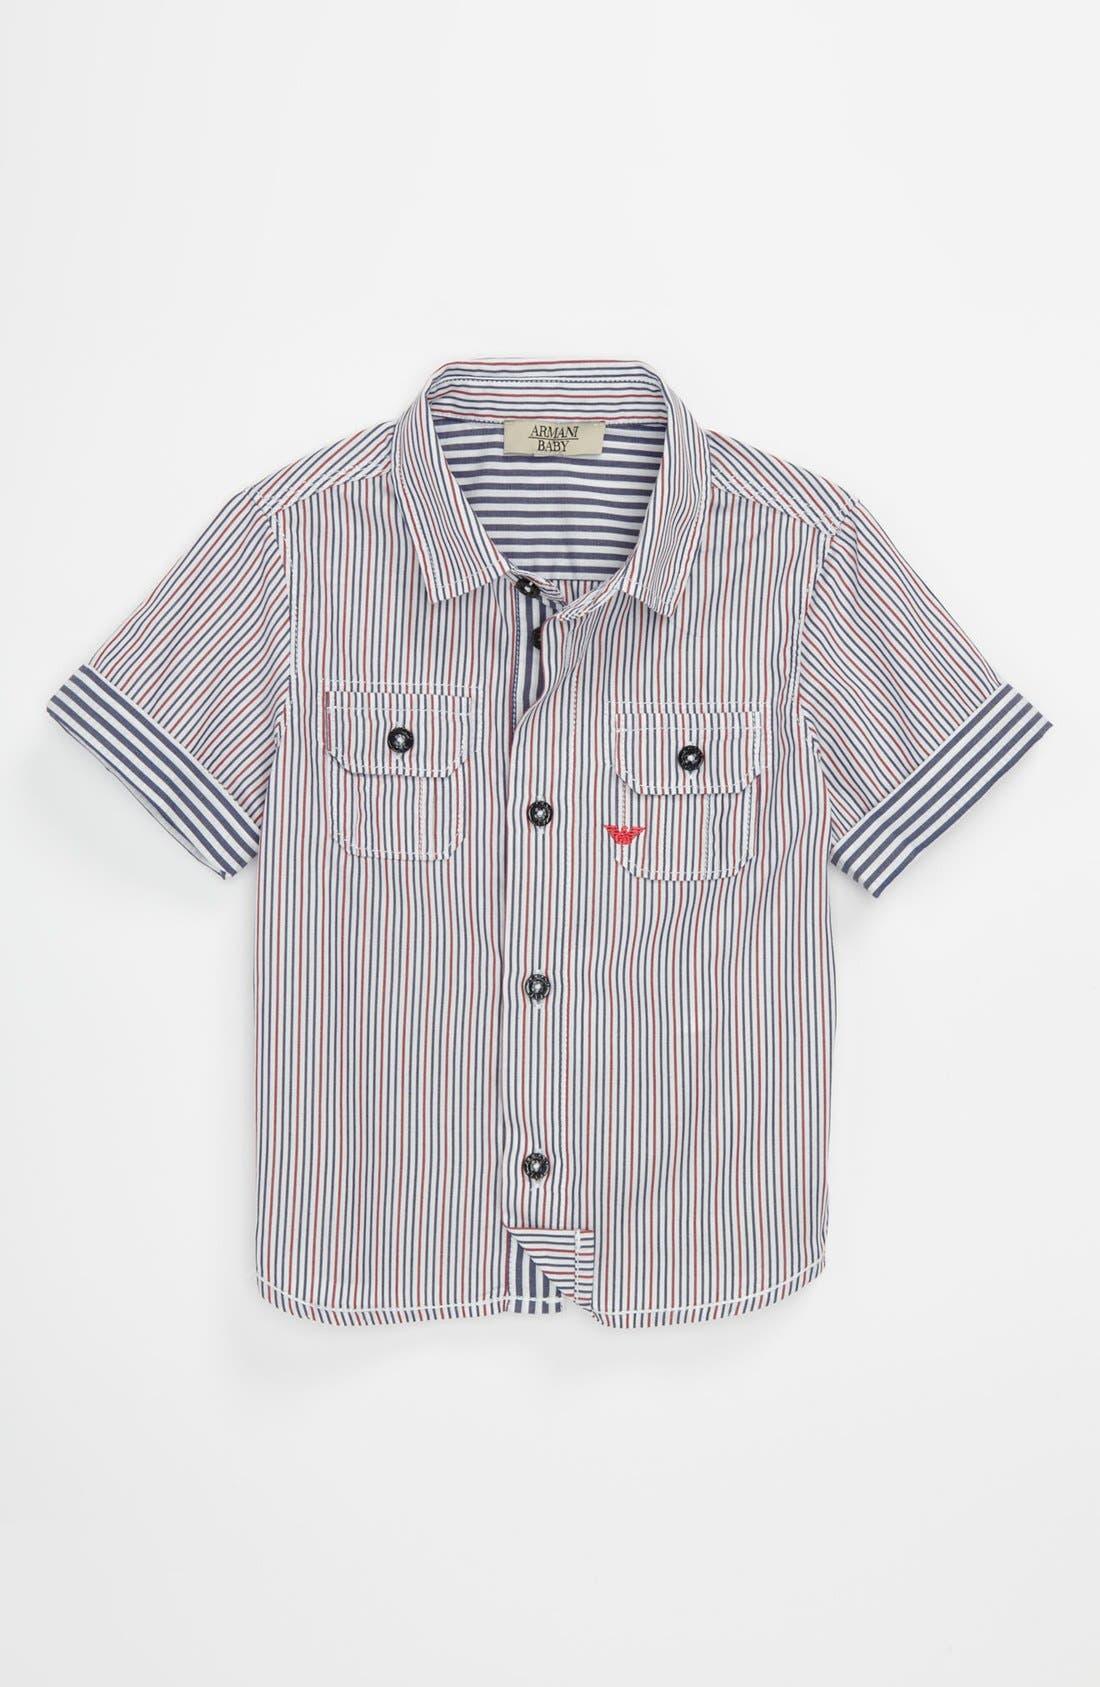 Alternate Image 1 Selected - Armani Junior Stripe Shirt (Baby)